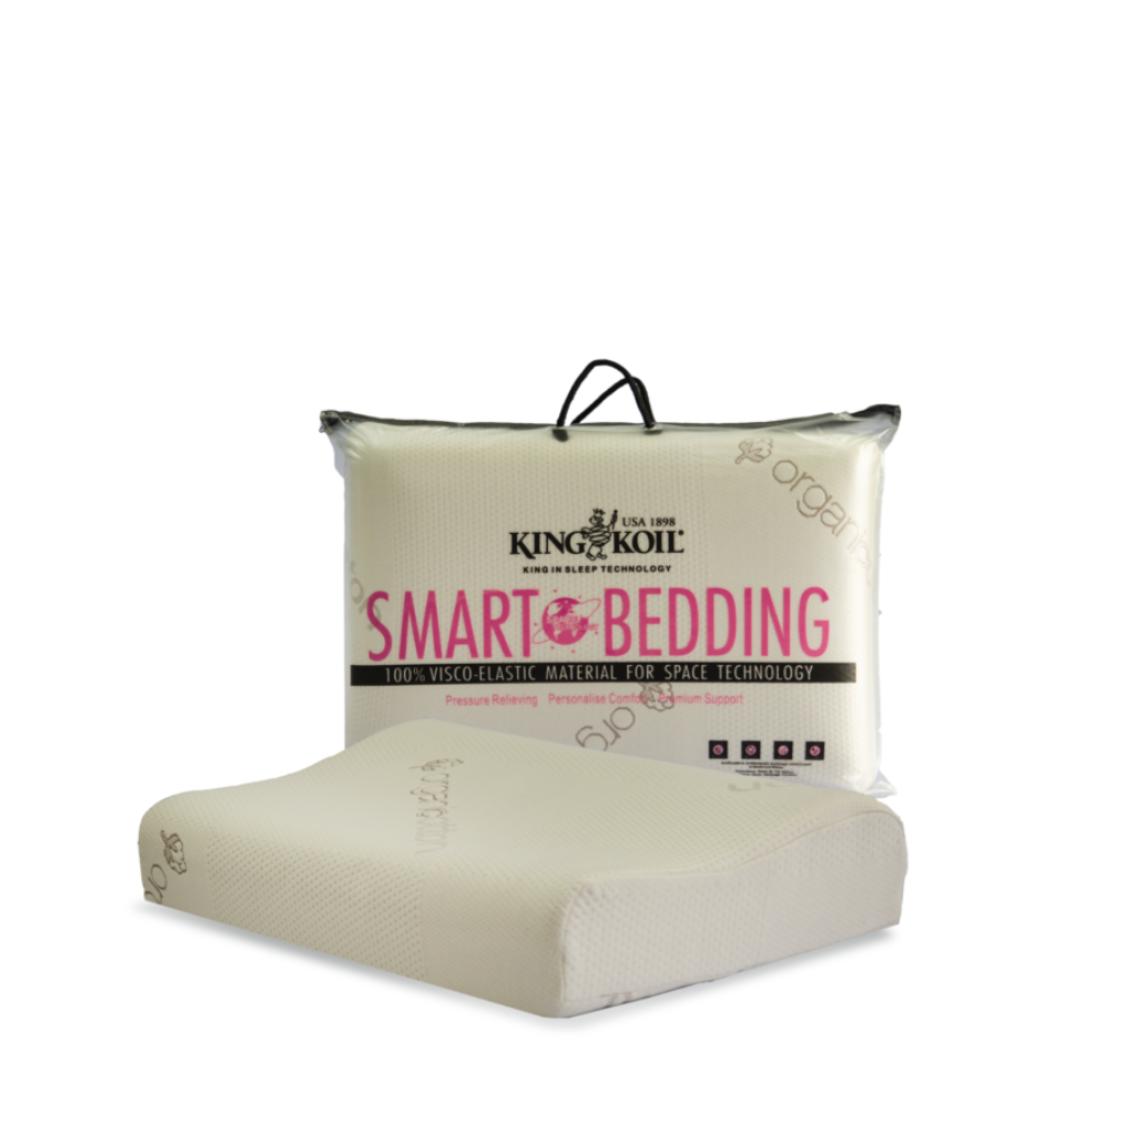 King Koil Smart Bedding Comfort Pro-Contour Pillow Organic Cotton